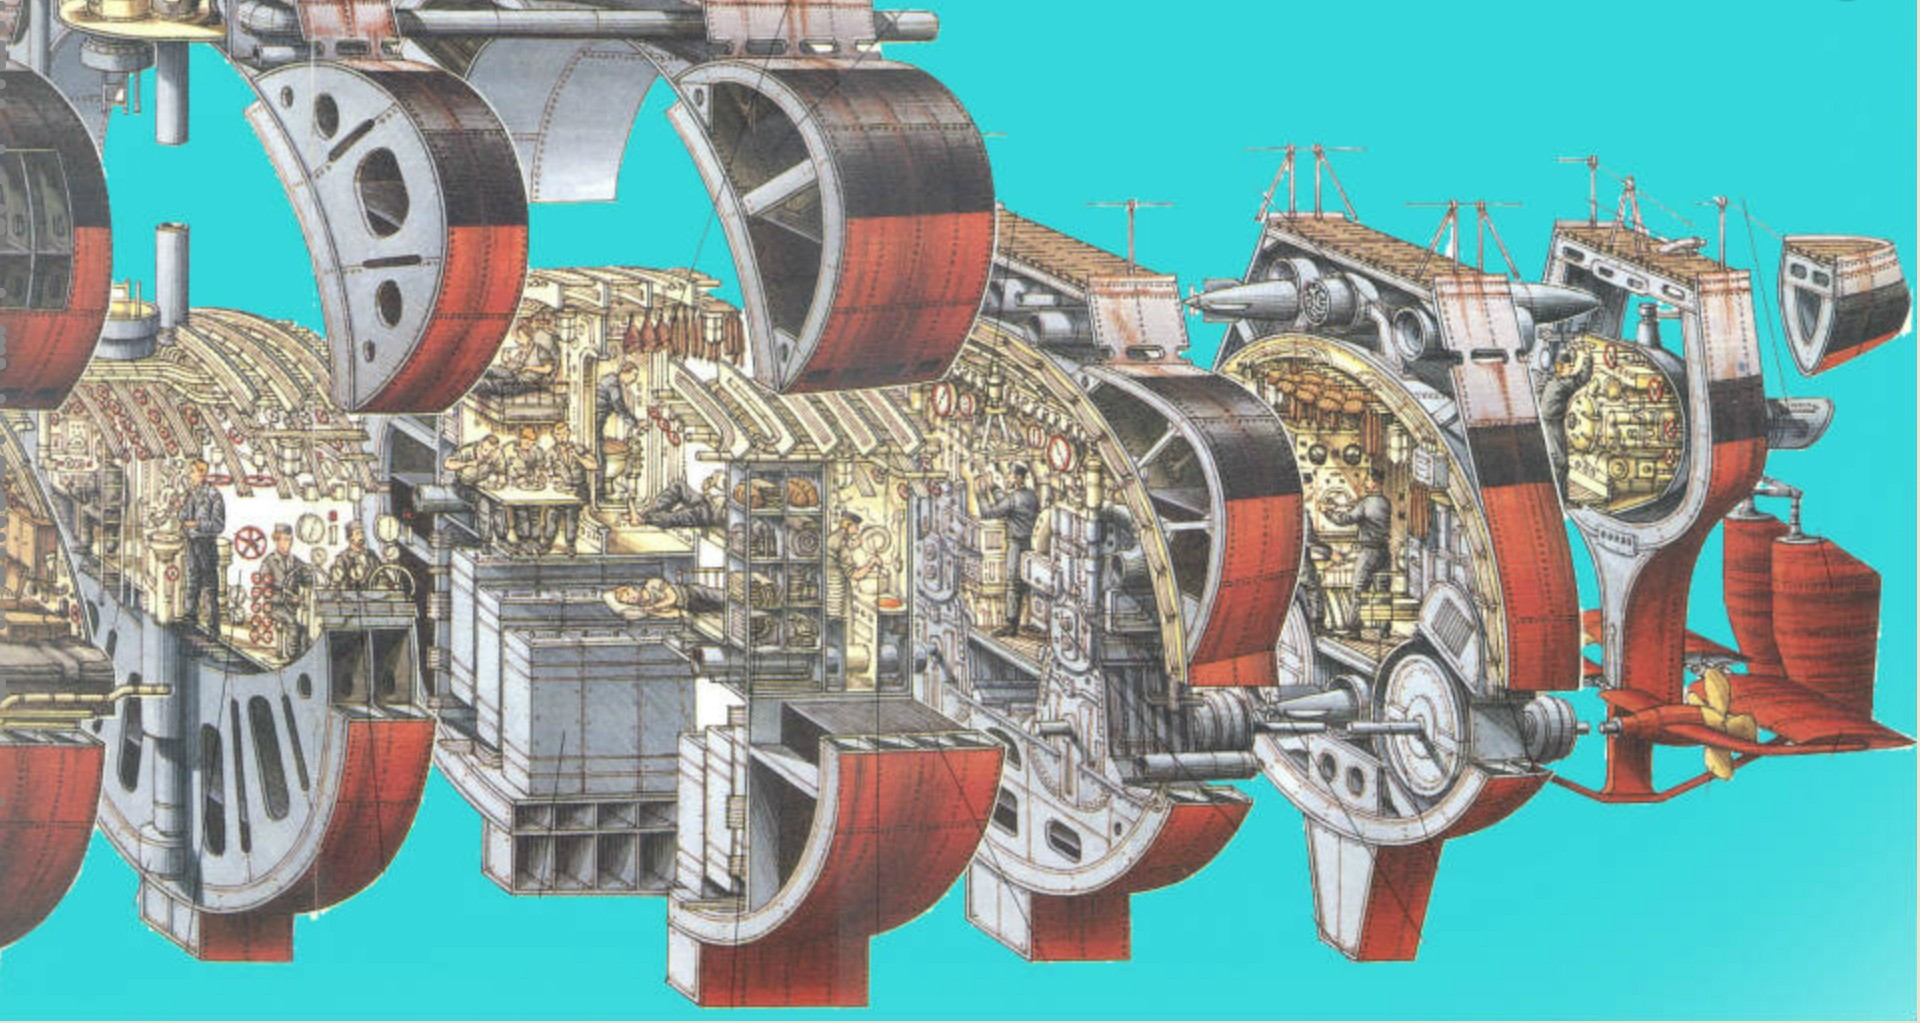 U-552 TRUMPETER Echelle 1/48 - Page 3 QCknVs